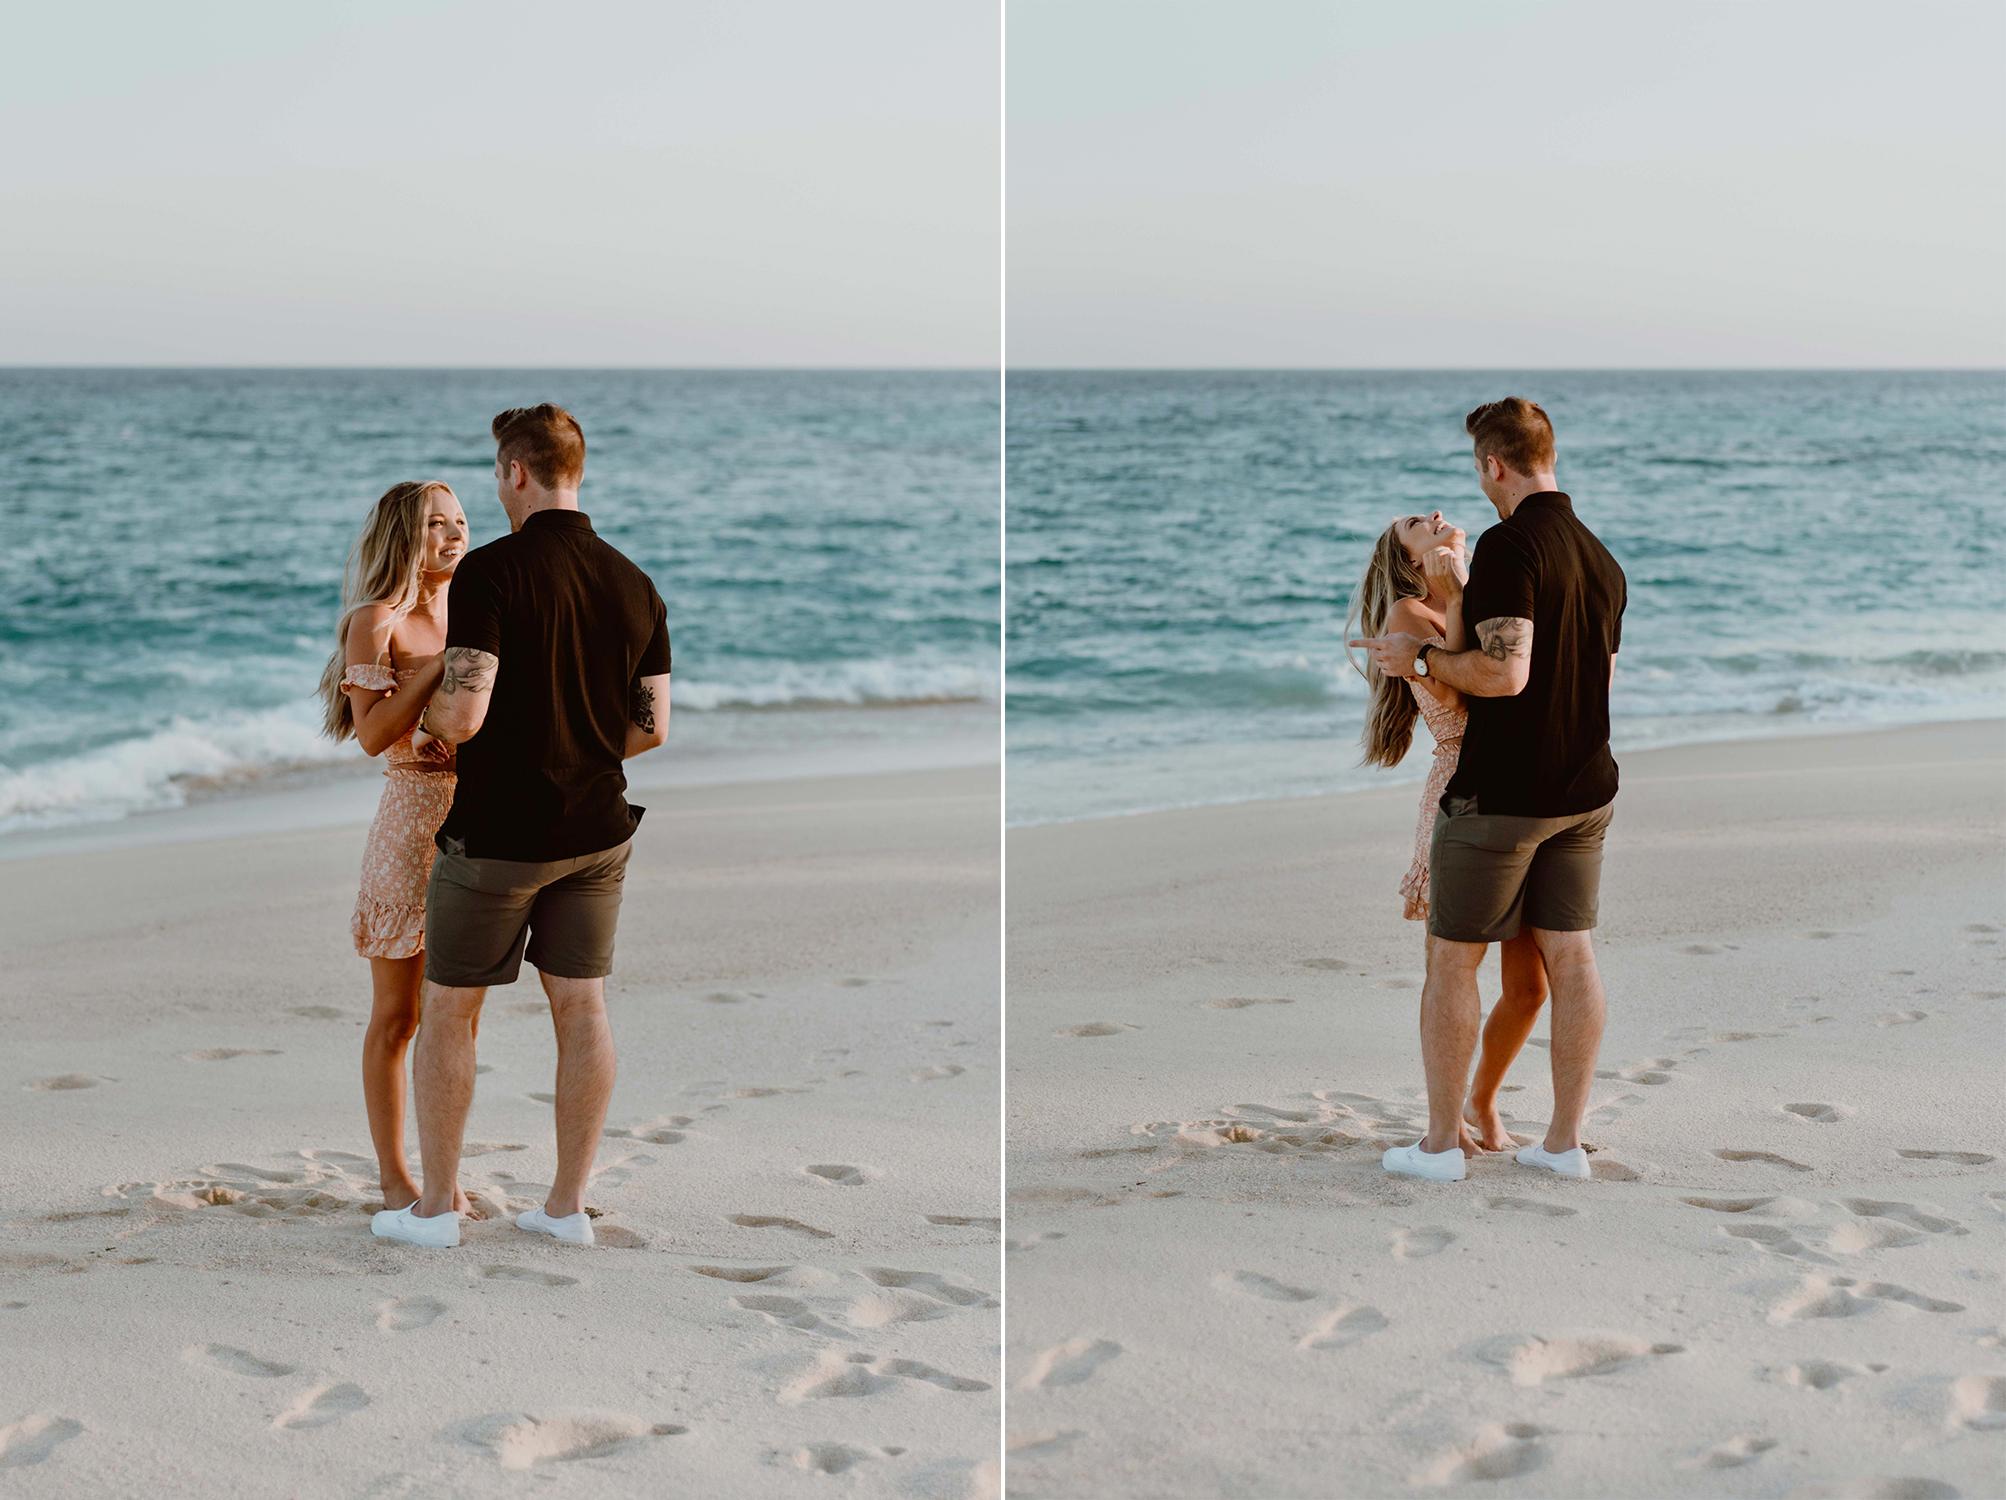 Morganne+Jarad+Engagement-8-9.jpg